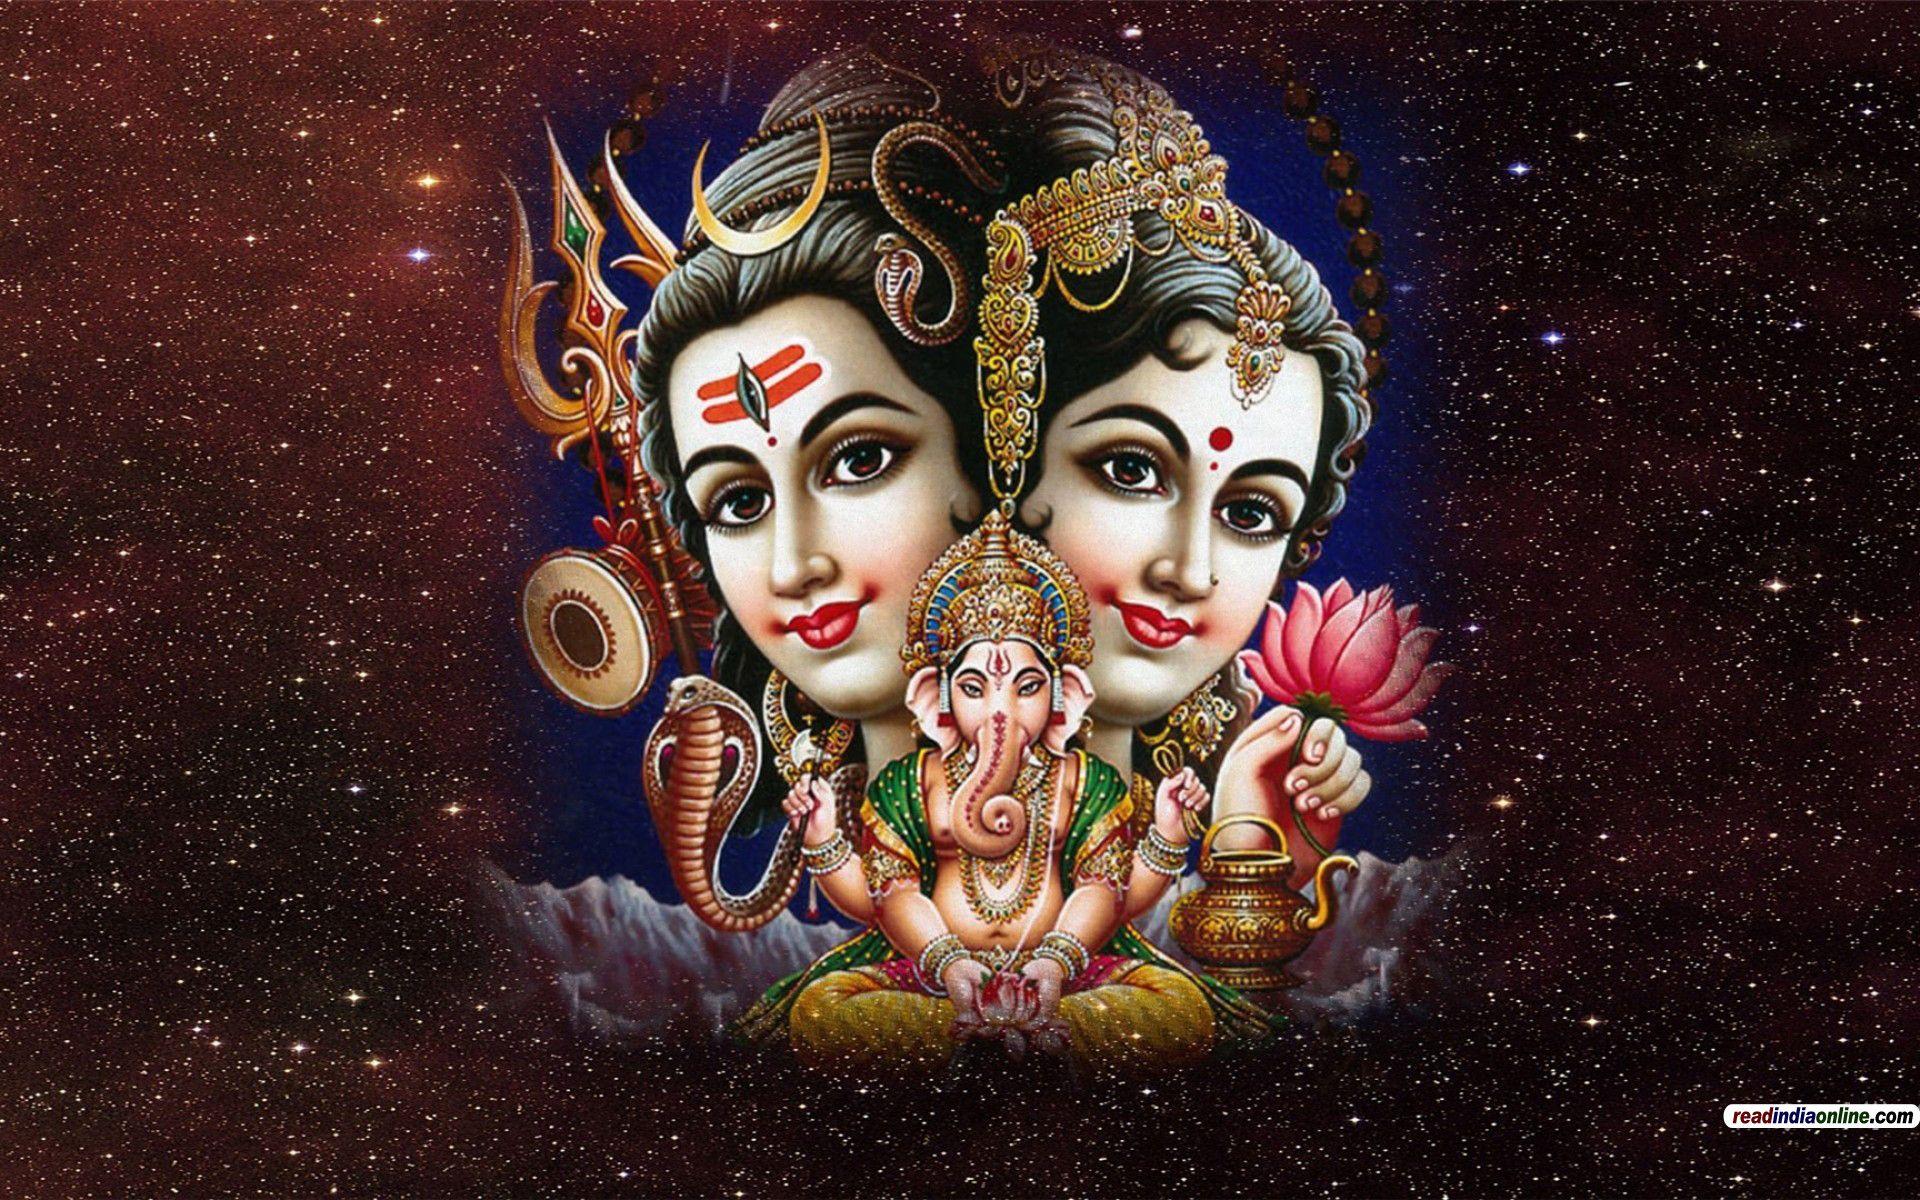 Hindu God Hd Wallpapers 1080p Wallpapersafari Hd Wallpapers 1080p Lord Murugan Wallpapers Hindu Gods